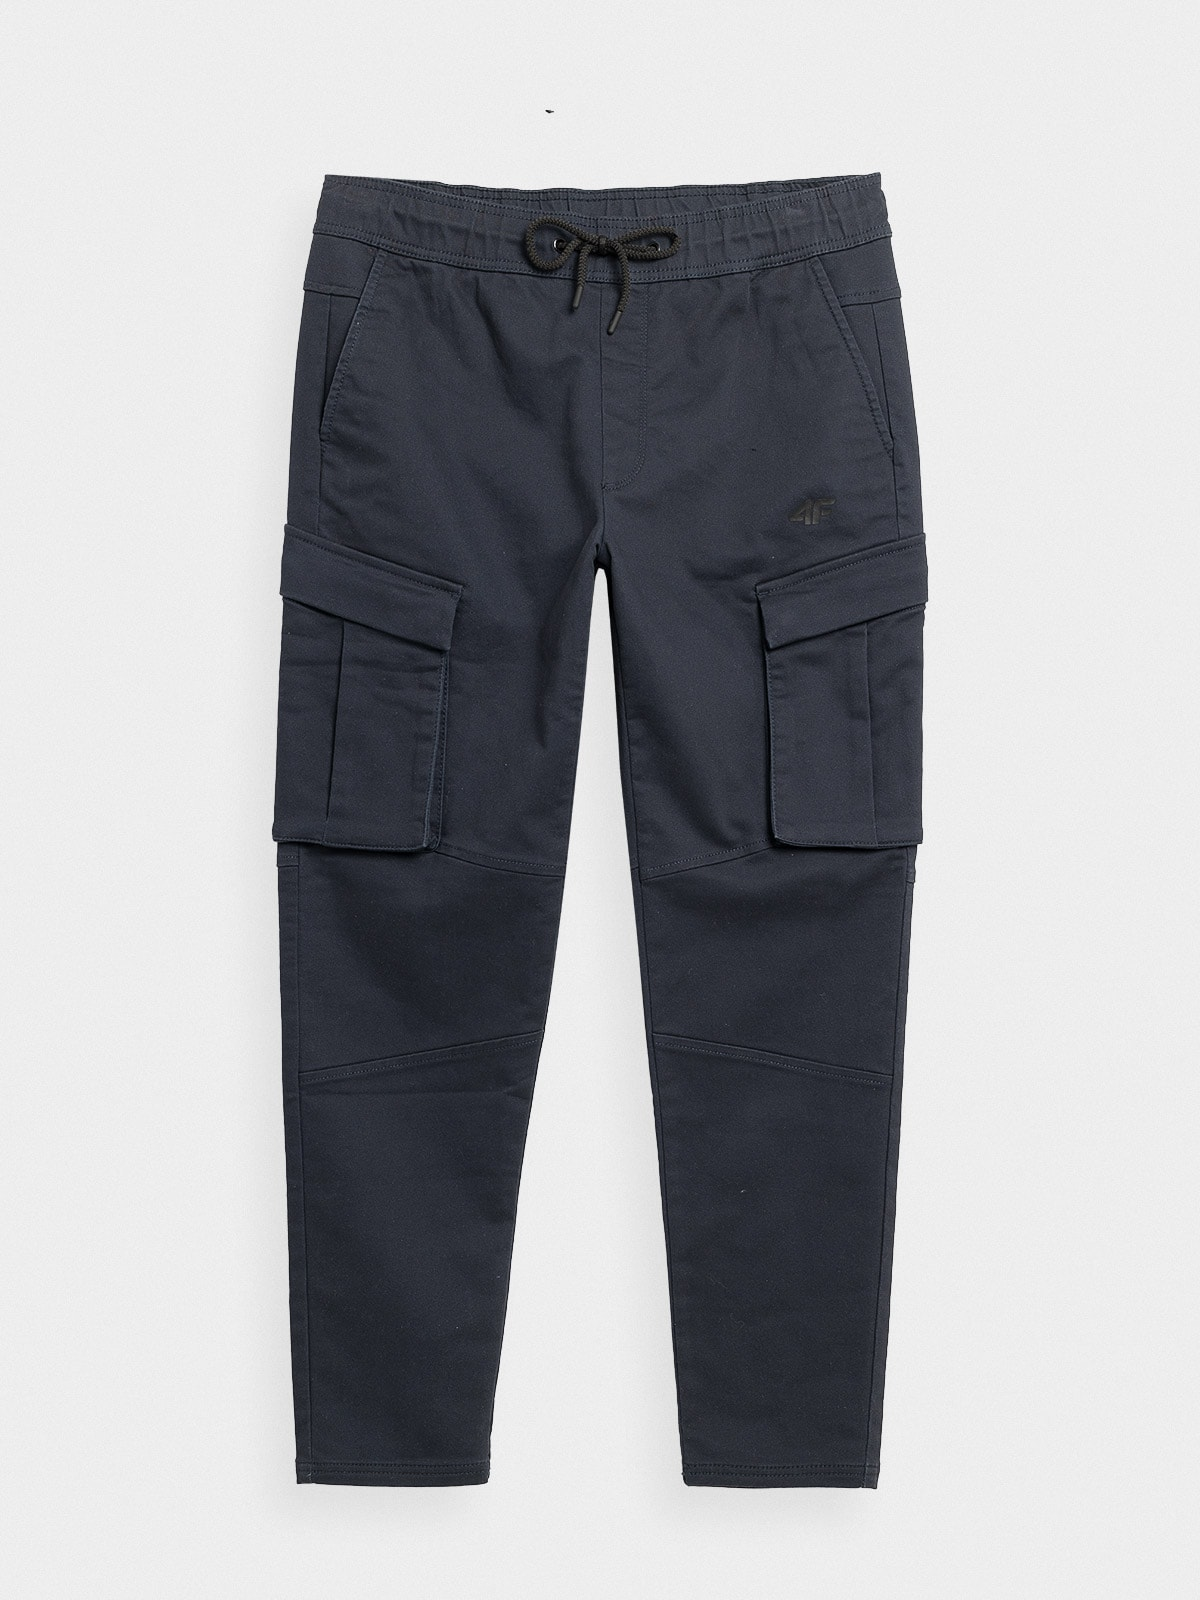 Spodnie casual joggery męskie